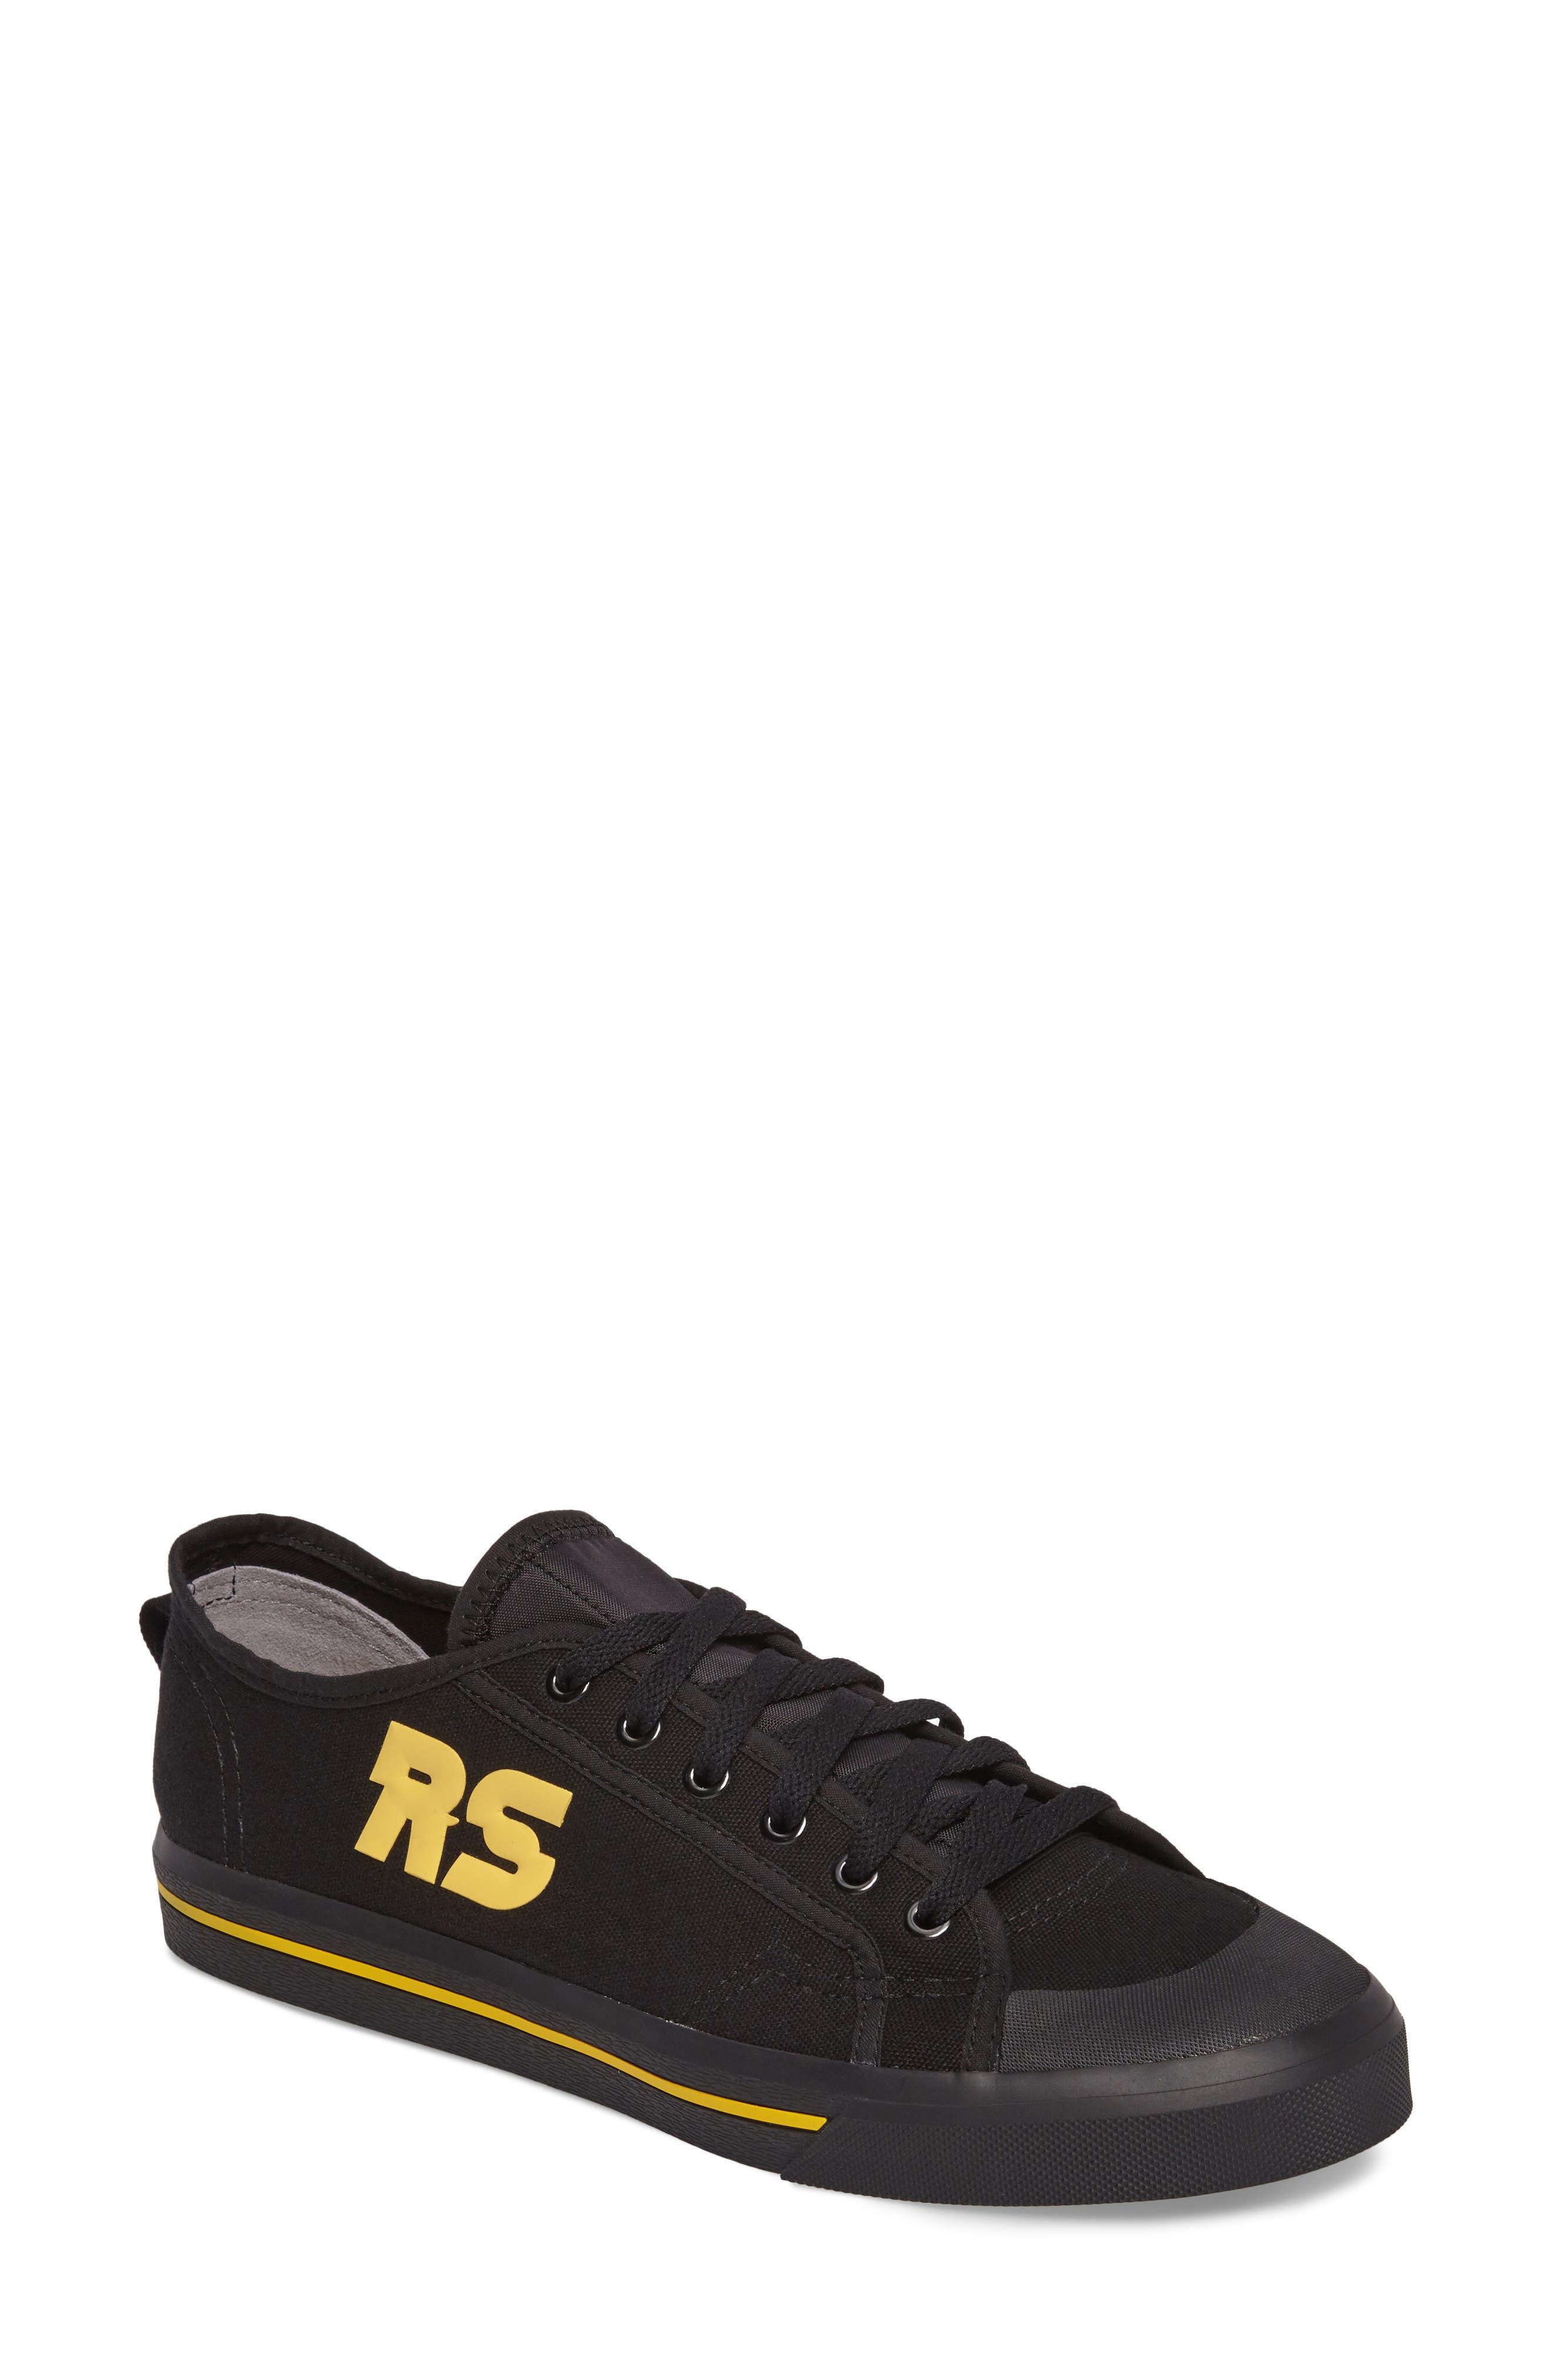 adidas by Raf Simons Spirit Low Top Sneaker (Women)